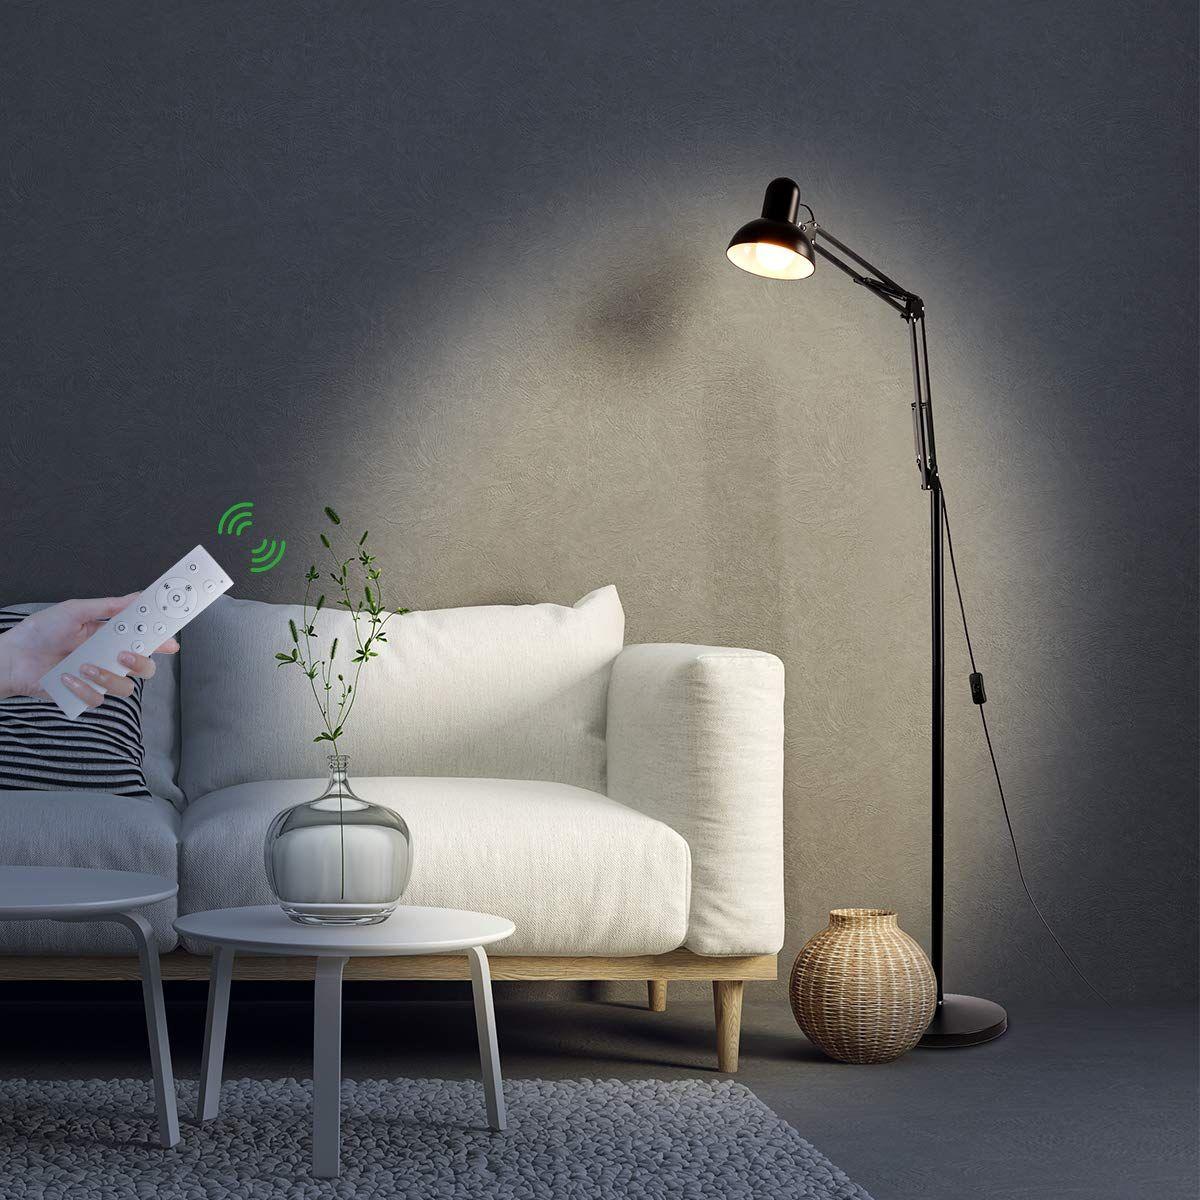 Sunix LED Reading Floor Lamp, Dimmable, Energy Saving